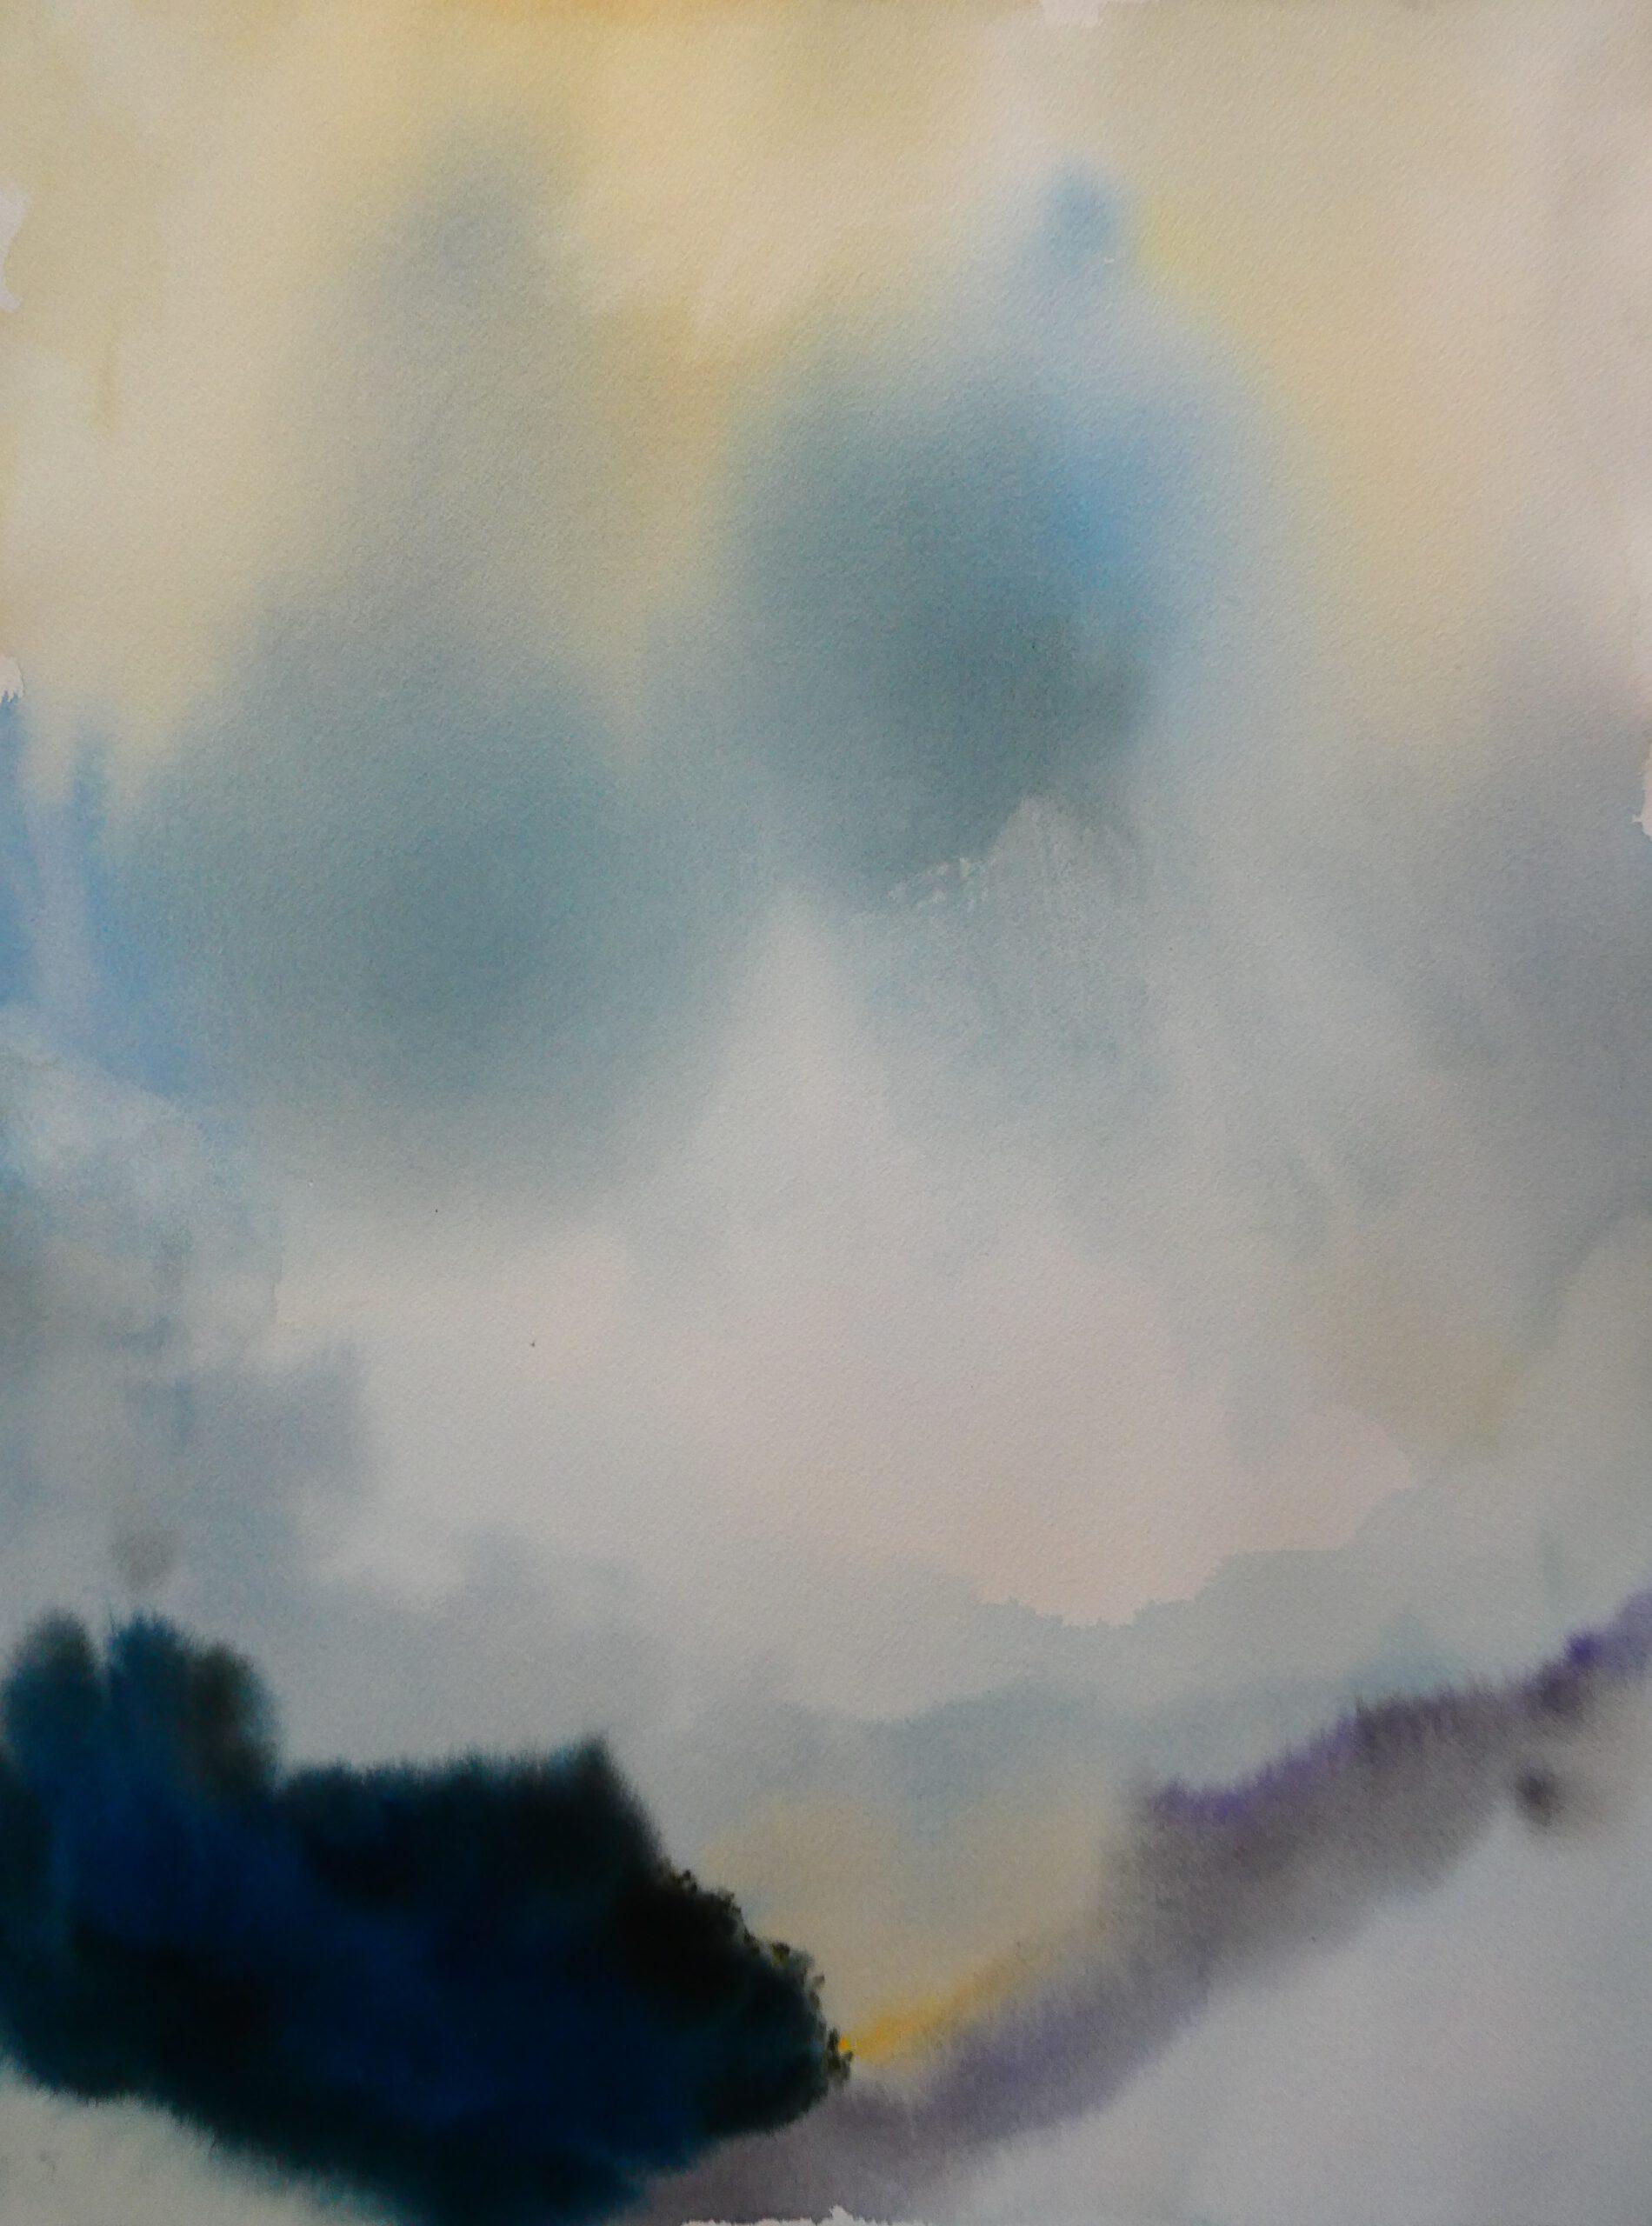 Aquarell, 60 x 80 cm